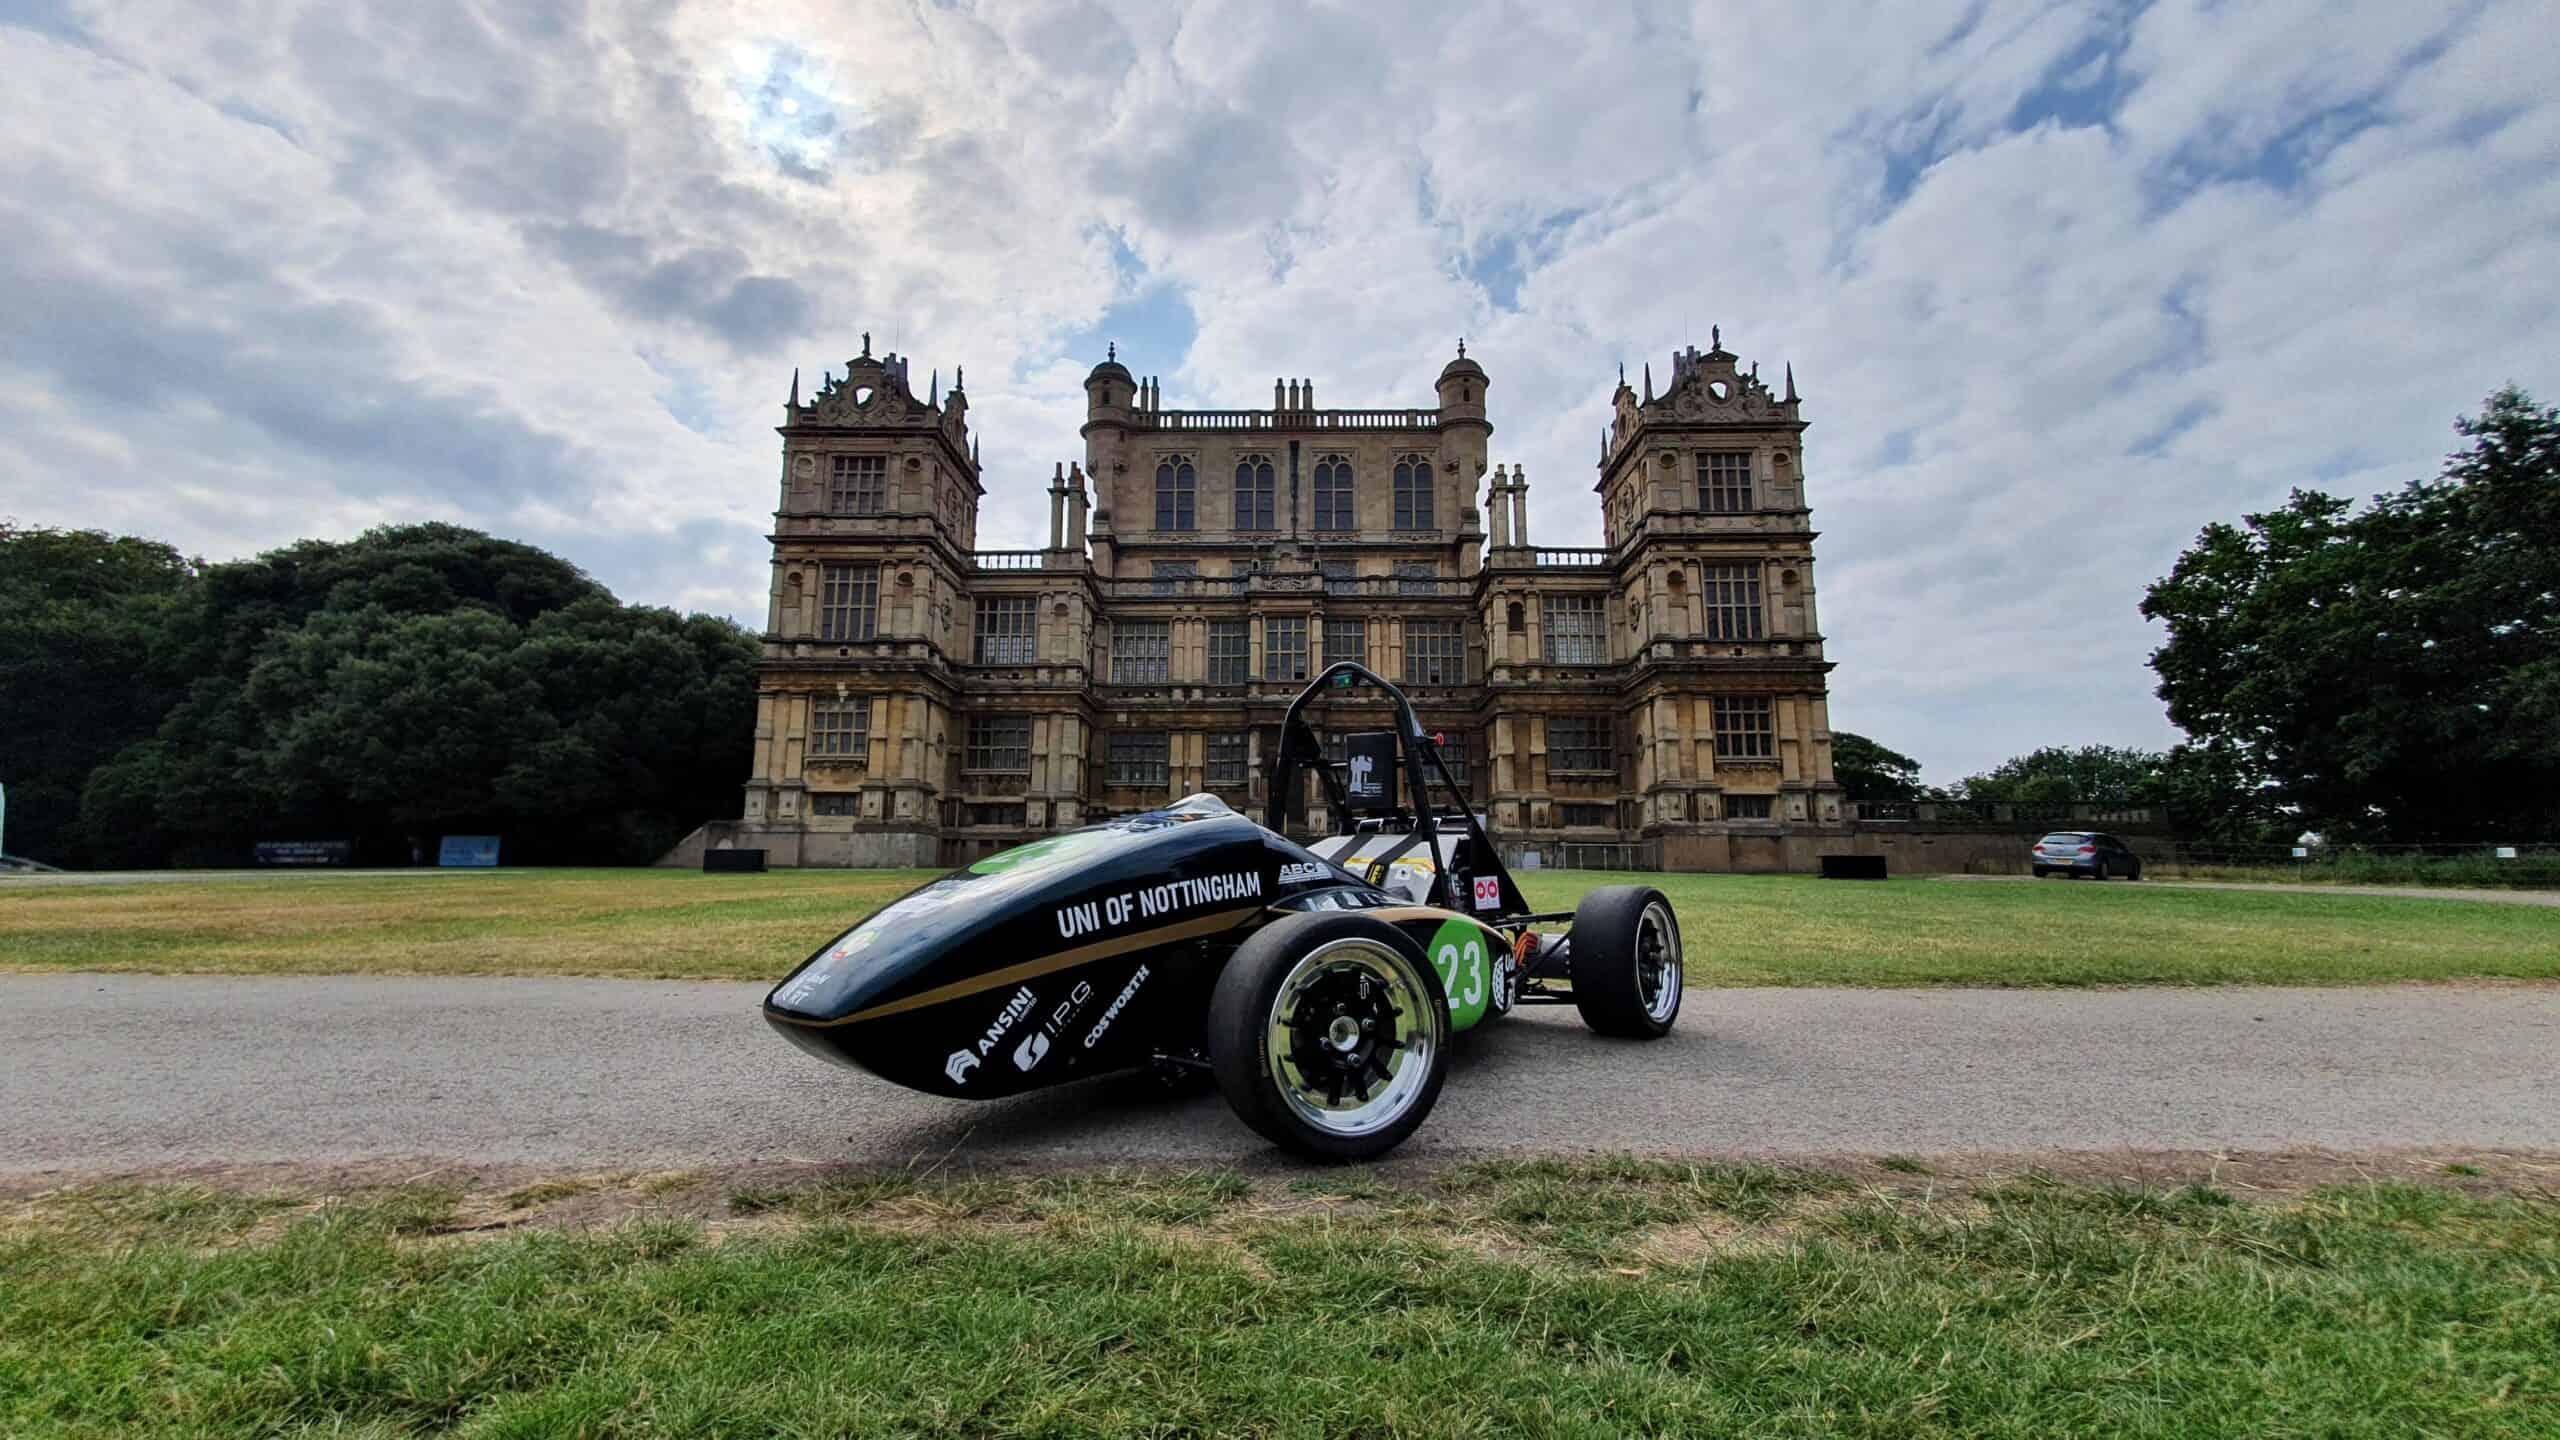 UoN Formula Student Race Car with Ansini Body Work